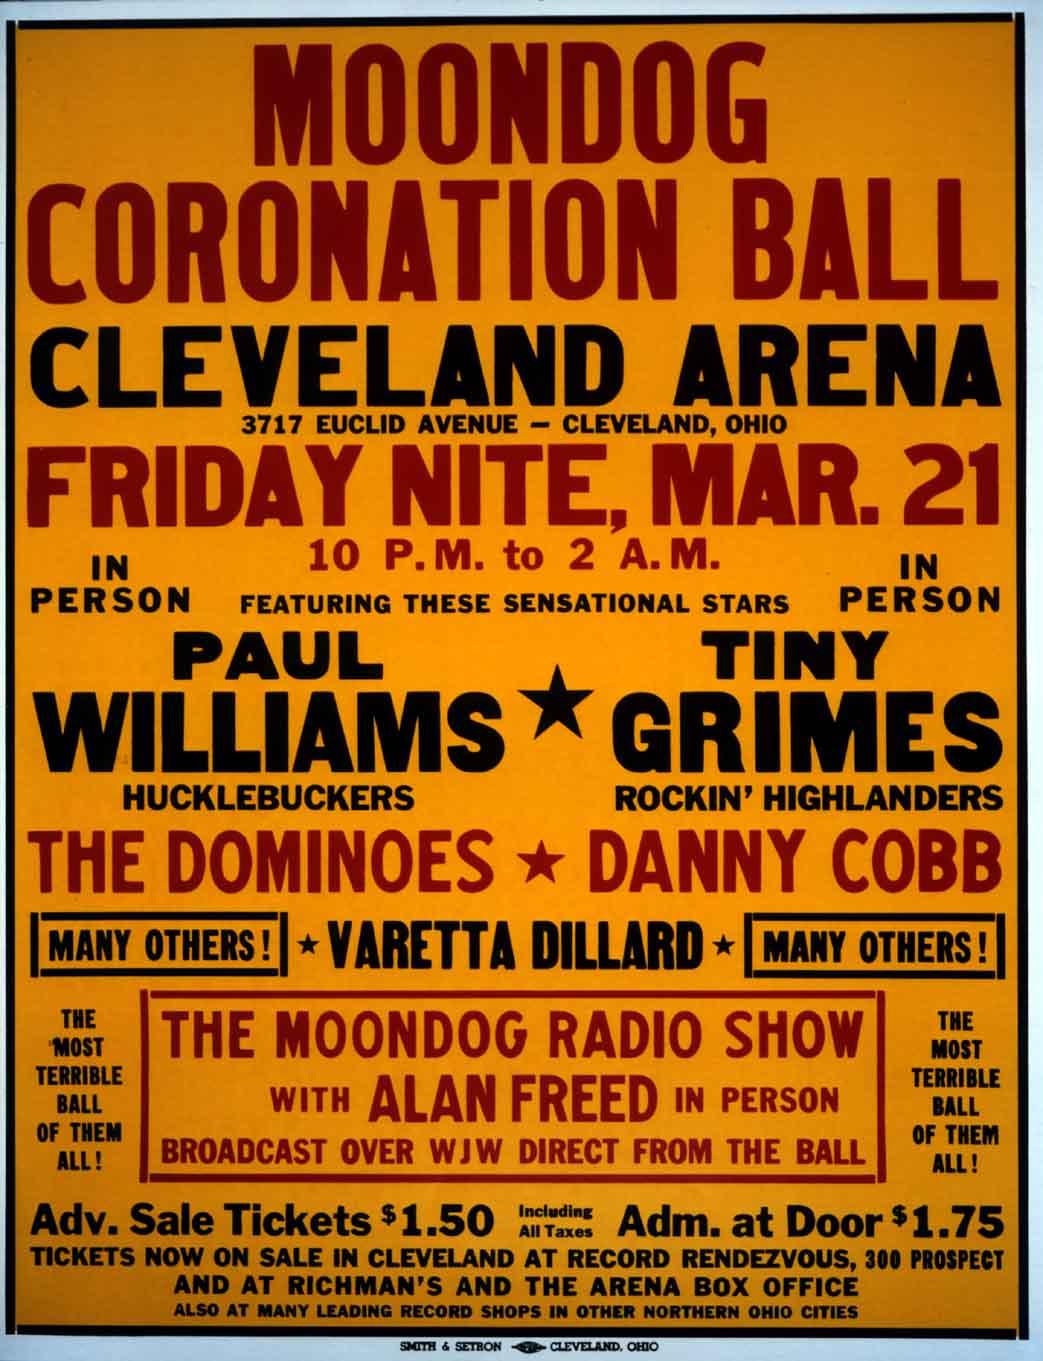 Moondog Coronation Ball - Wikipedia